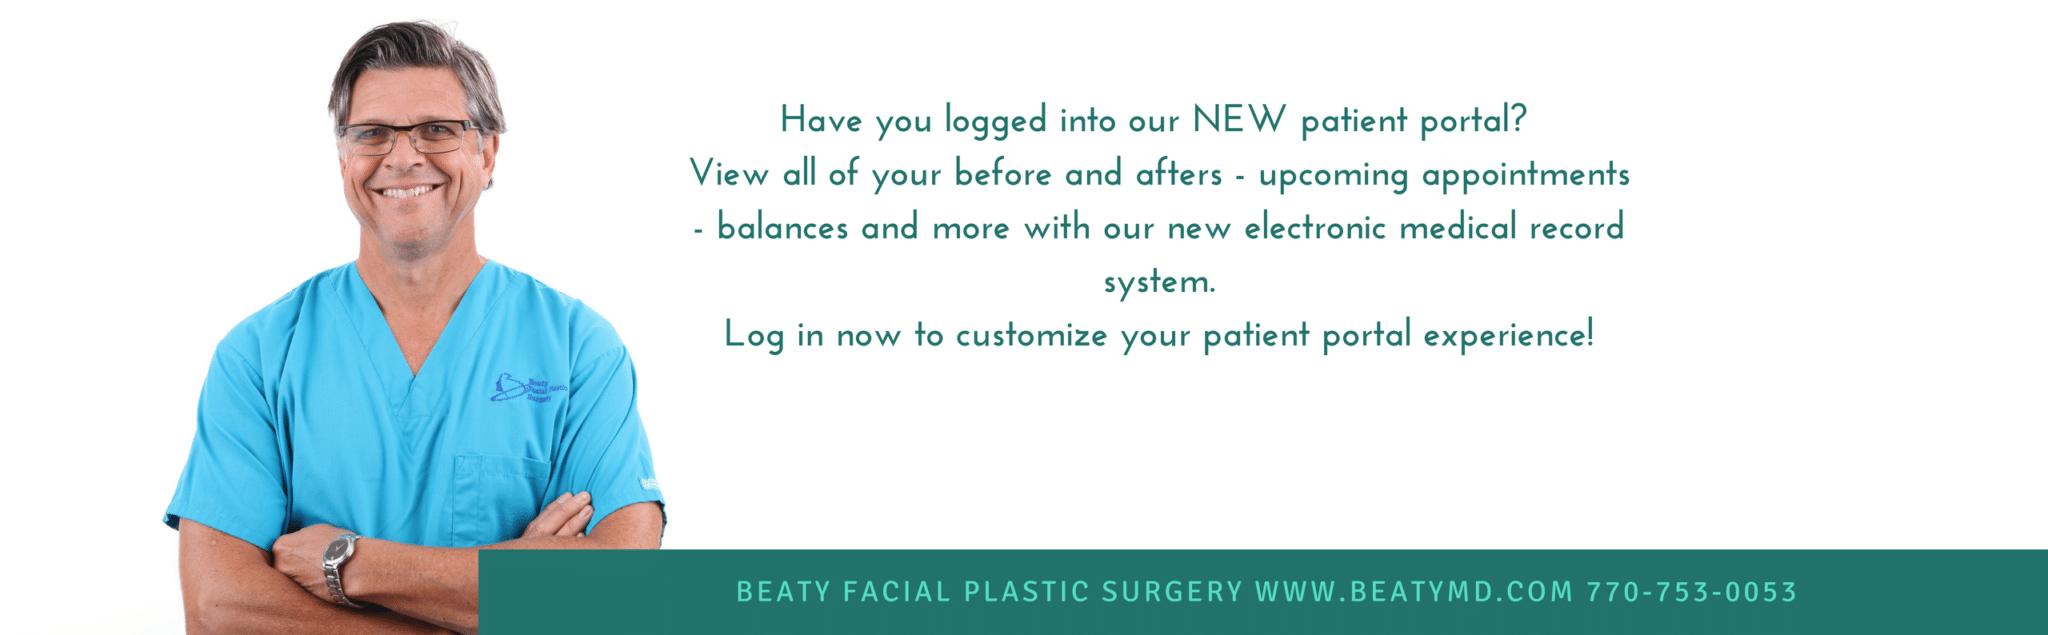 Beaty Facial Plastic Surgery Patient Portal